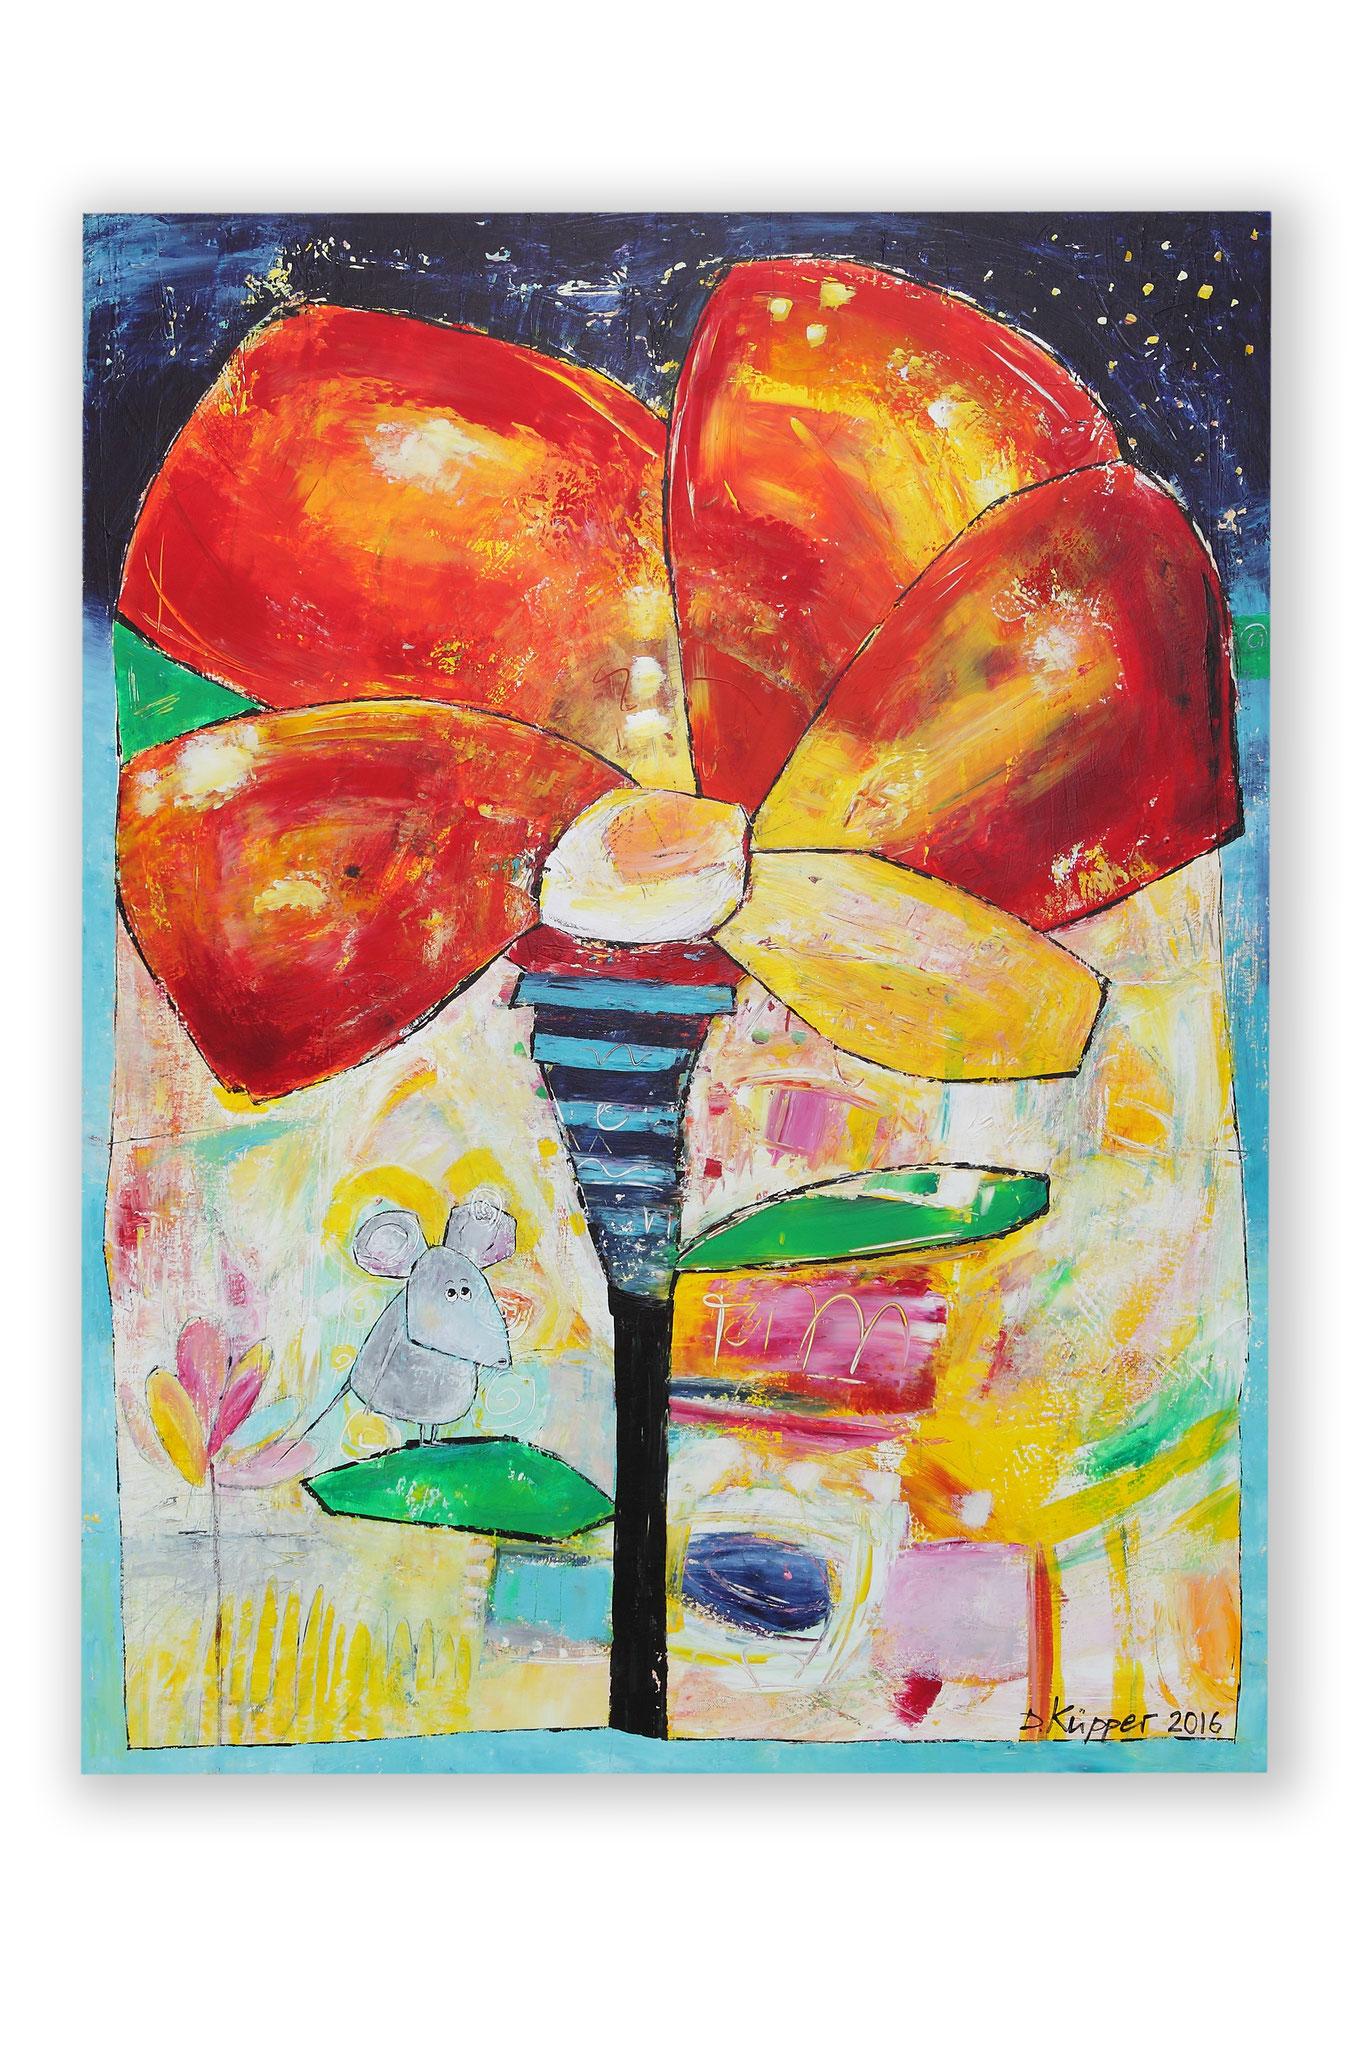 """Maus auf Blume"" - 90x110cm - Preis: 390 Euro"